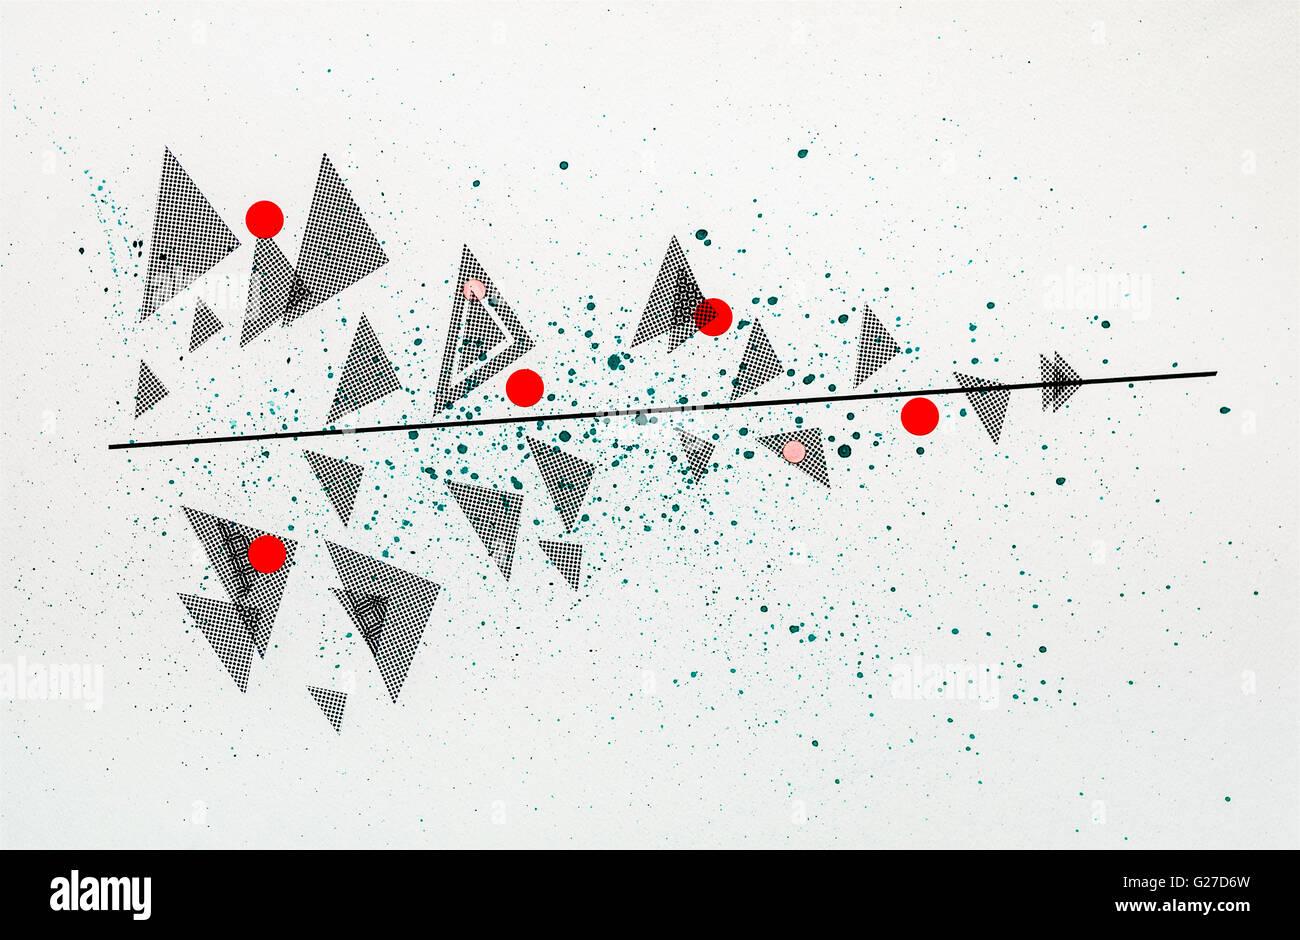 Modern abstract mixed-media drawing by Ed Buziak - France. Stock Photo